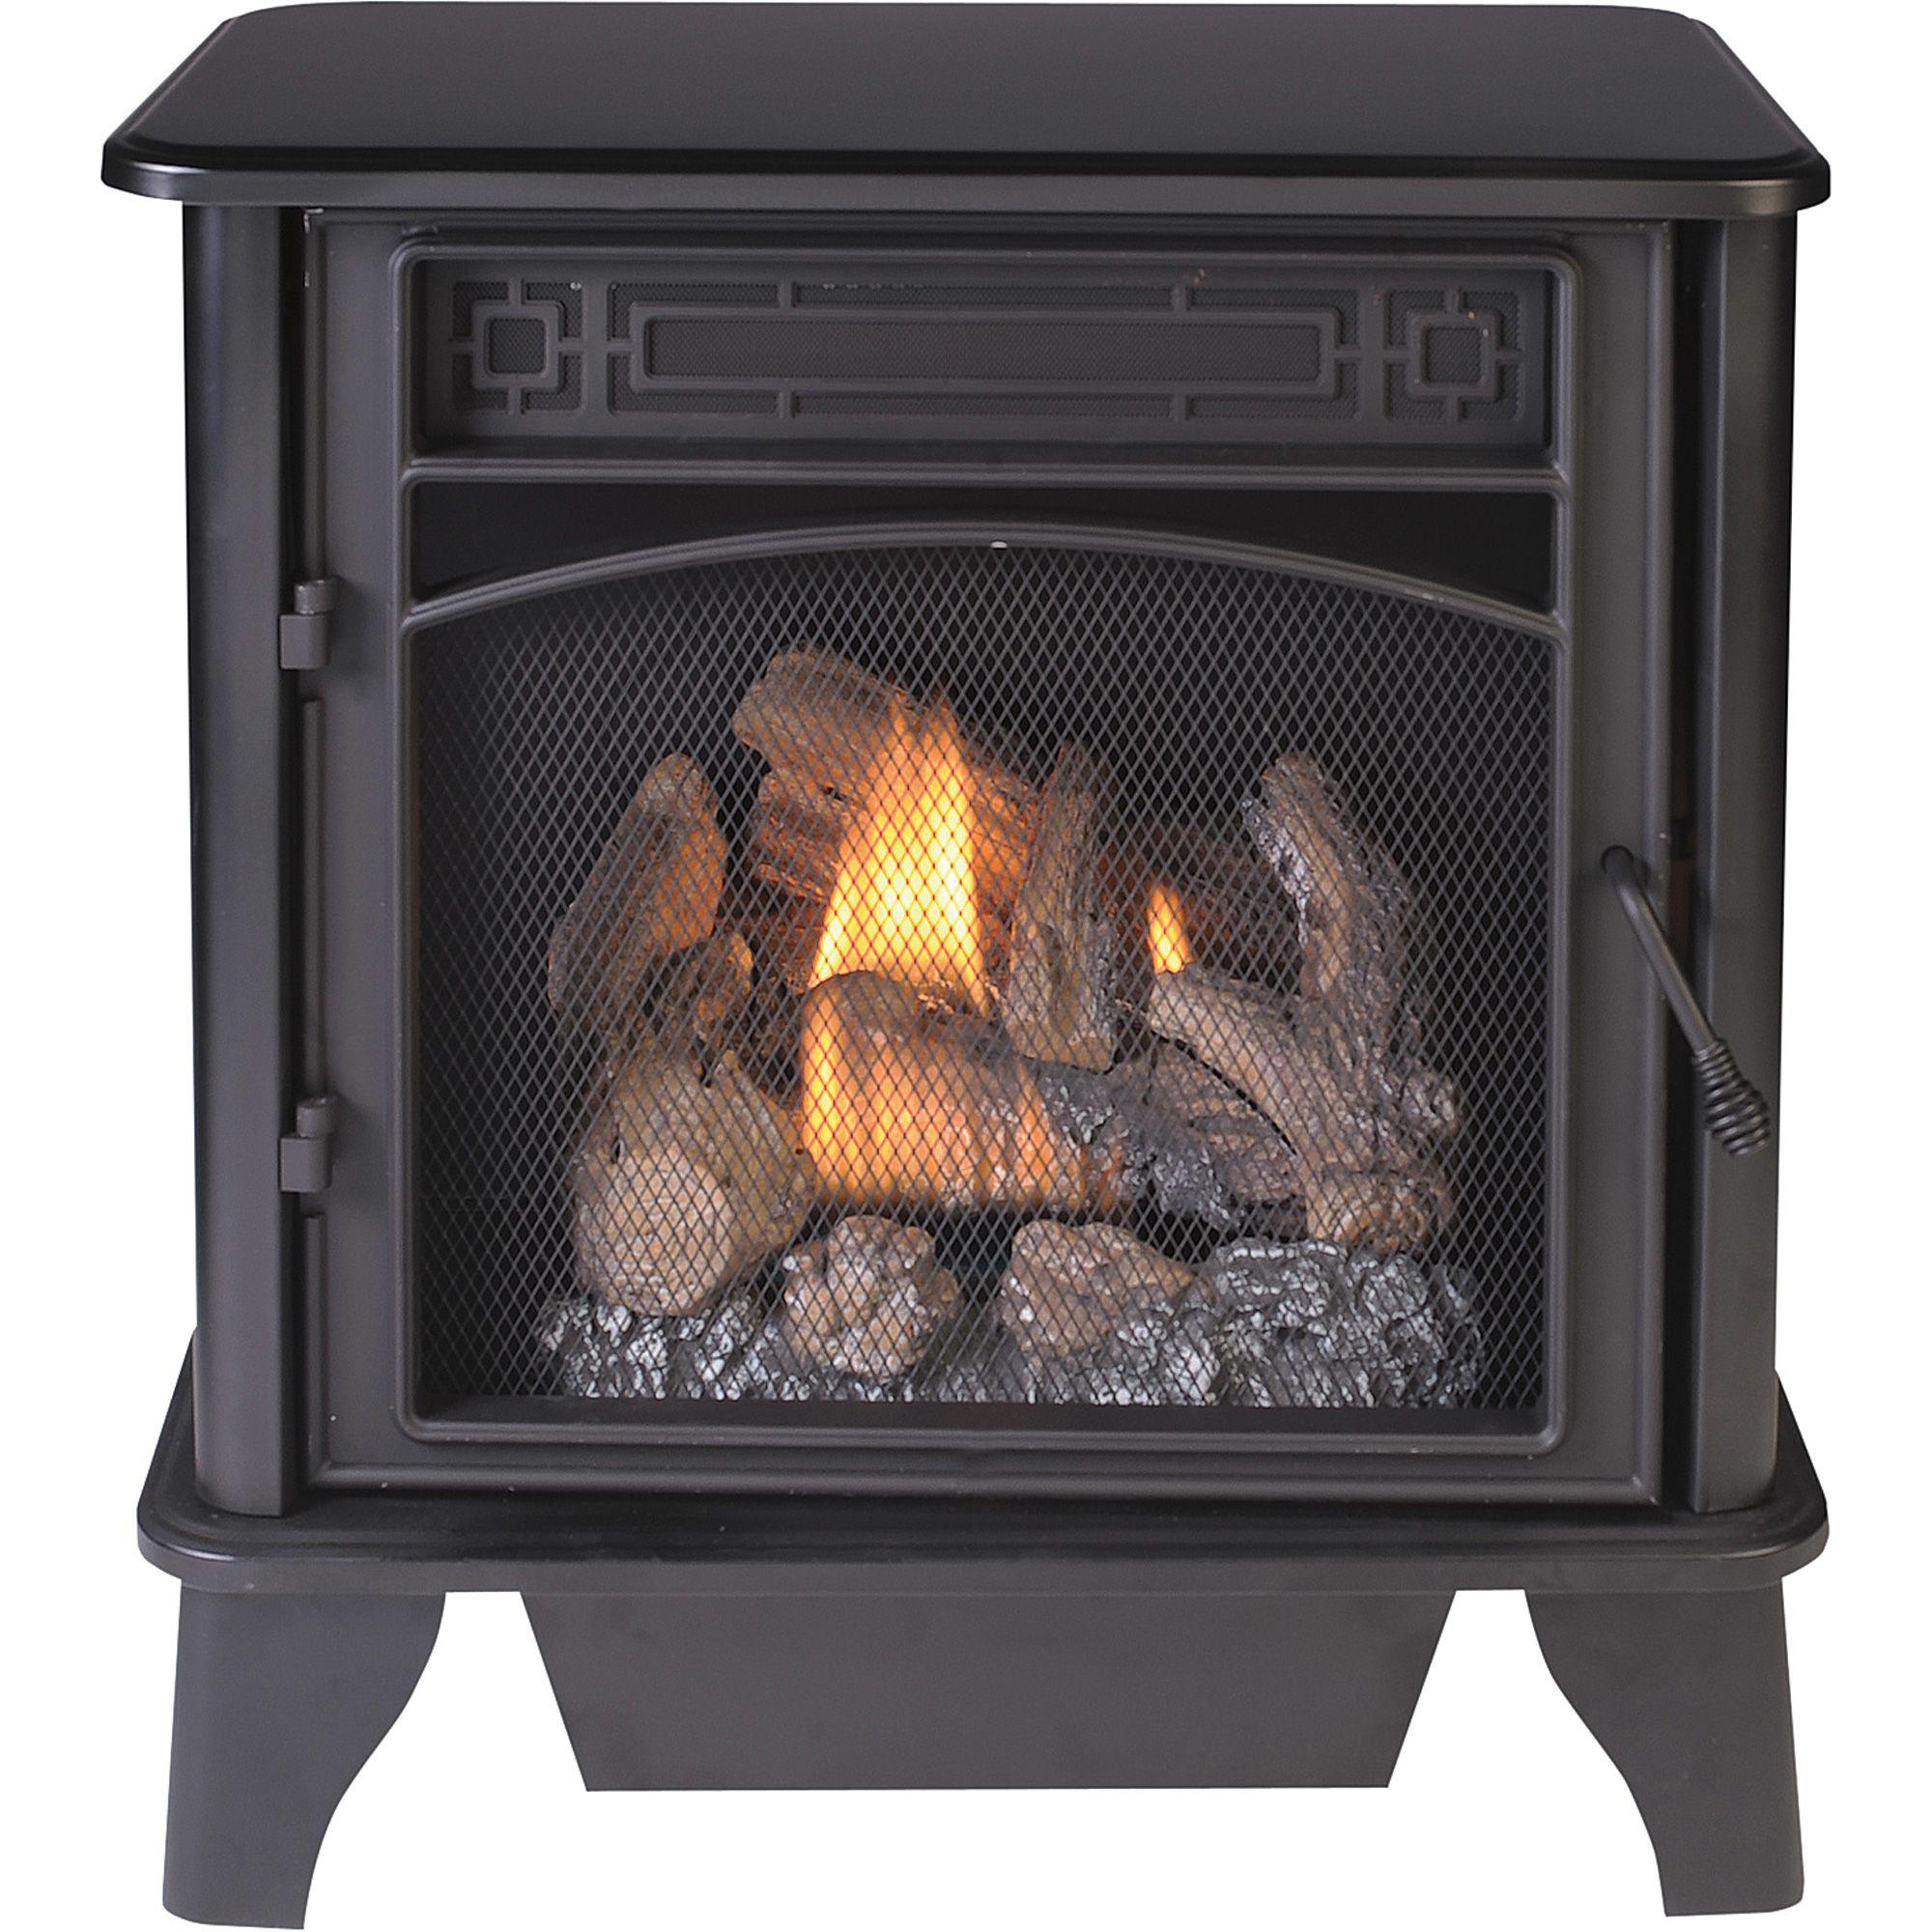 Procom Vent Free Dual Fuel Stove 23 000 Btu 850 Sq Ft Heating